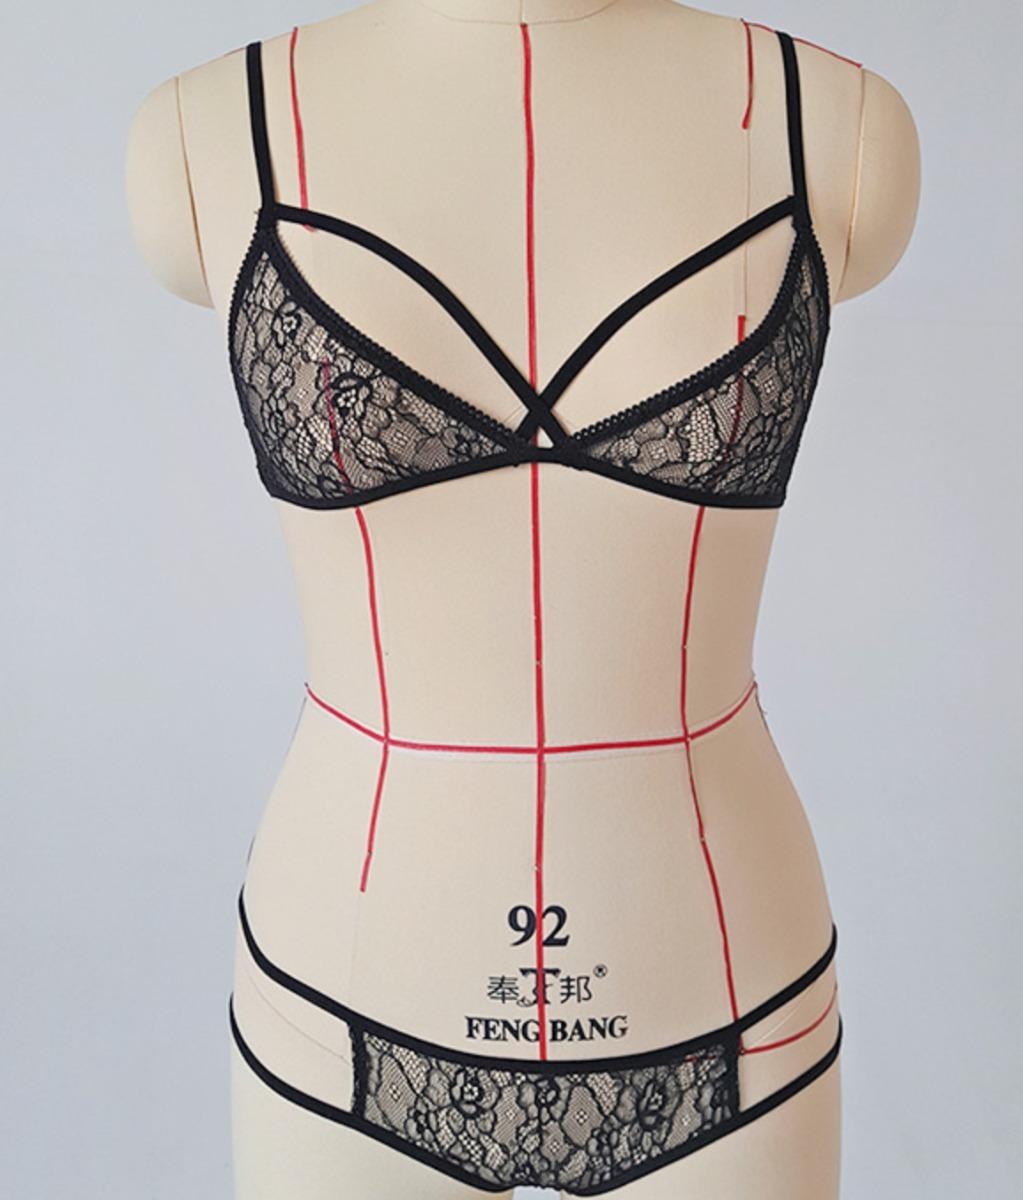 1b64802b8 sexy encaje brasier sujetador lenceria moda conjunto tanga. Cargando zoom.